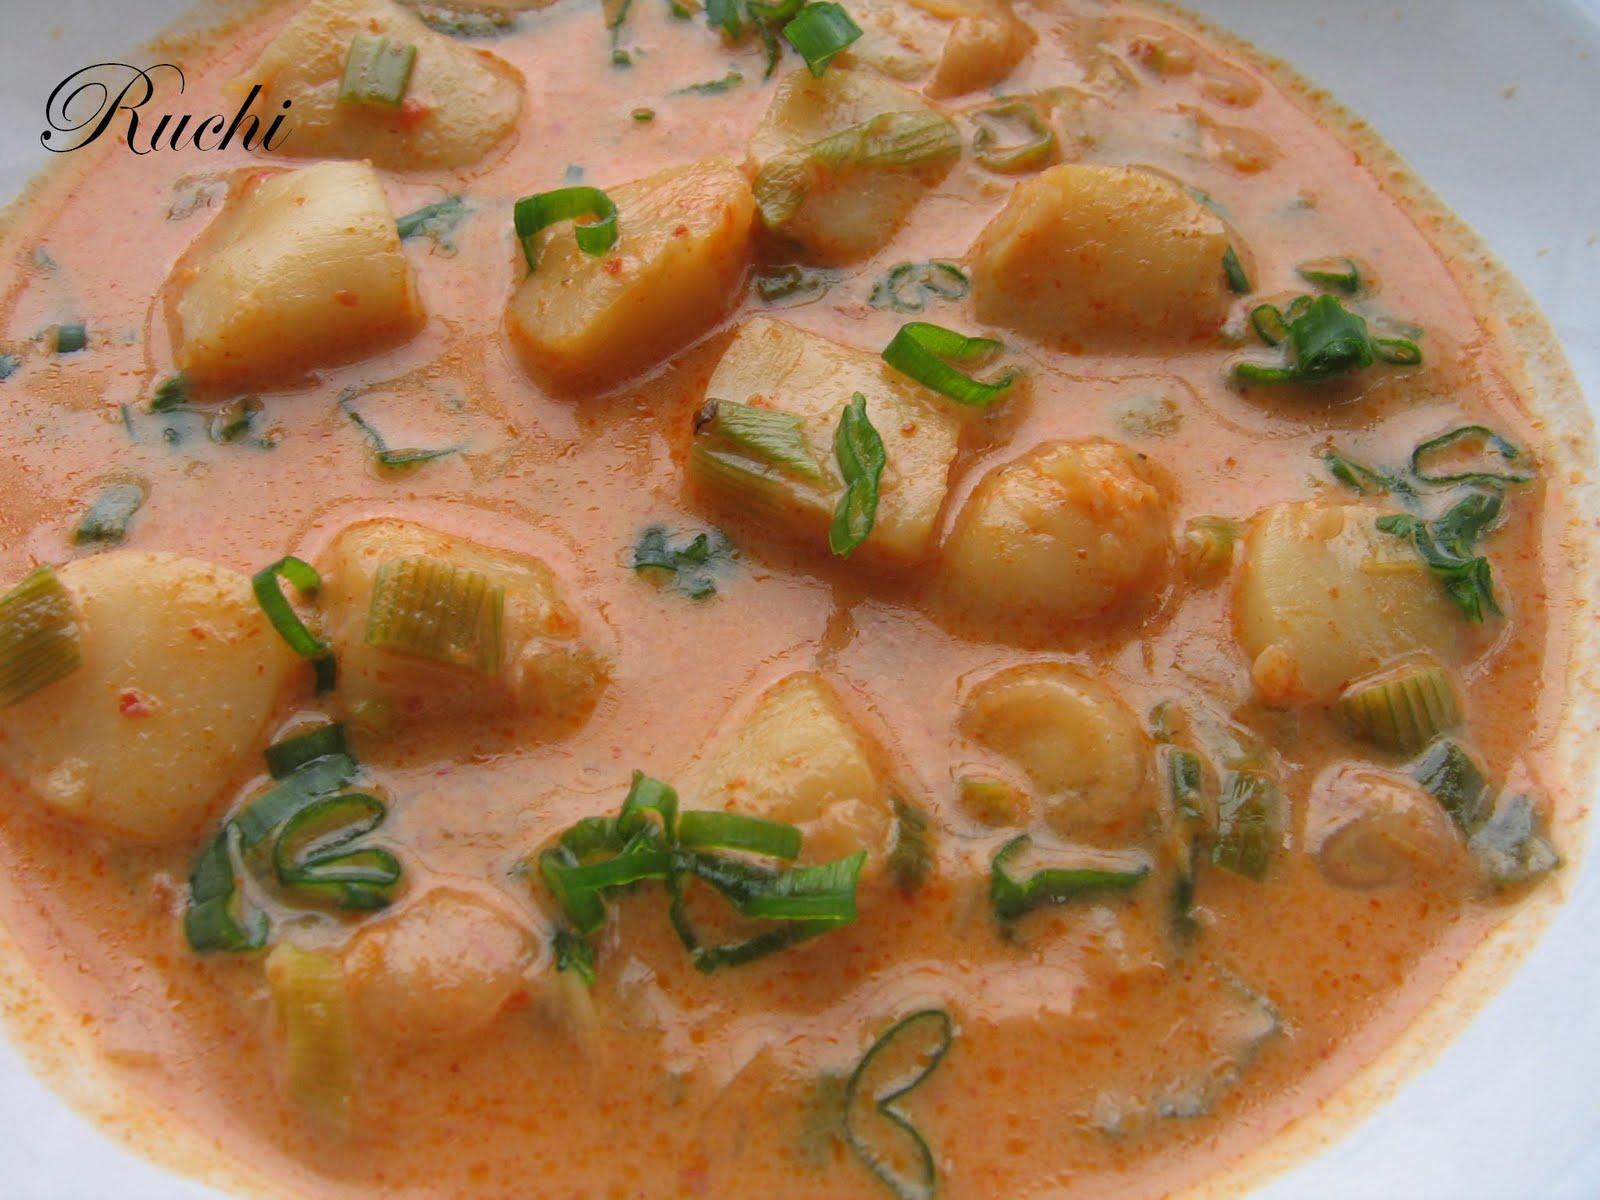 RUCHI: Thai Scallops curry